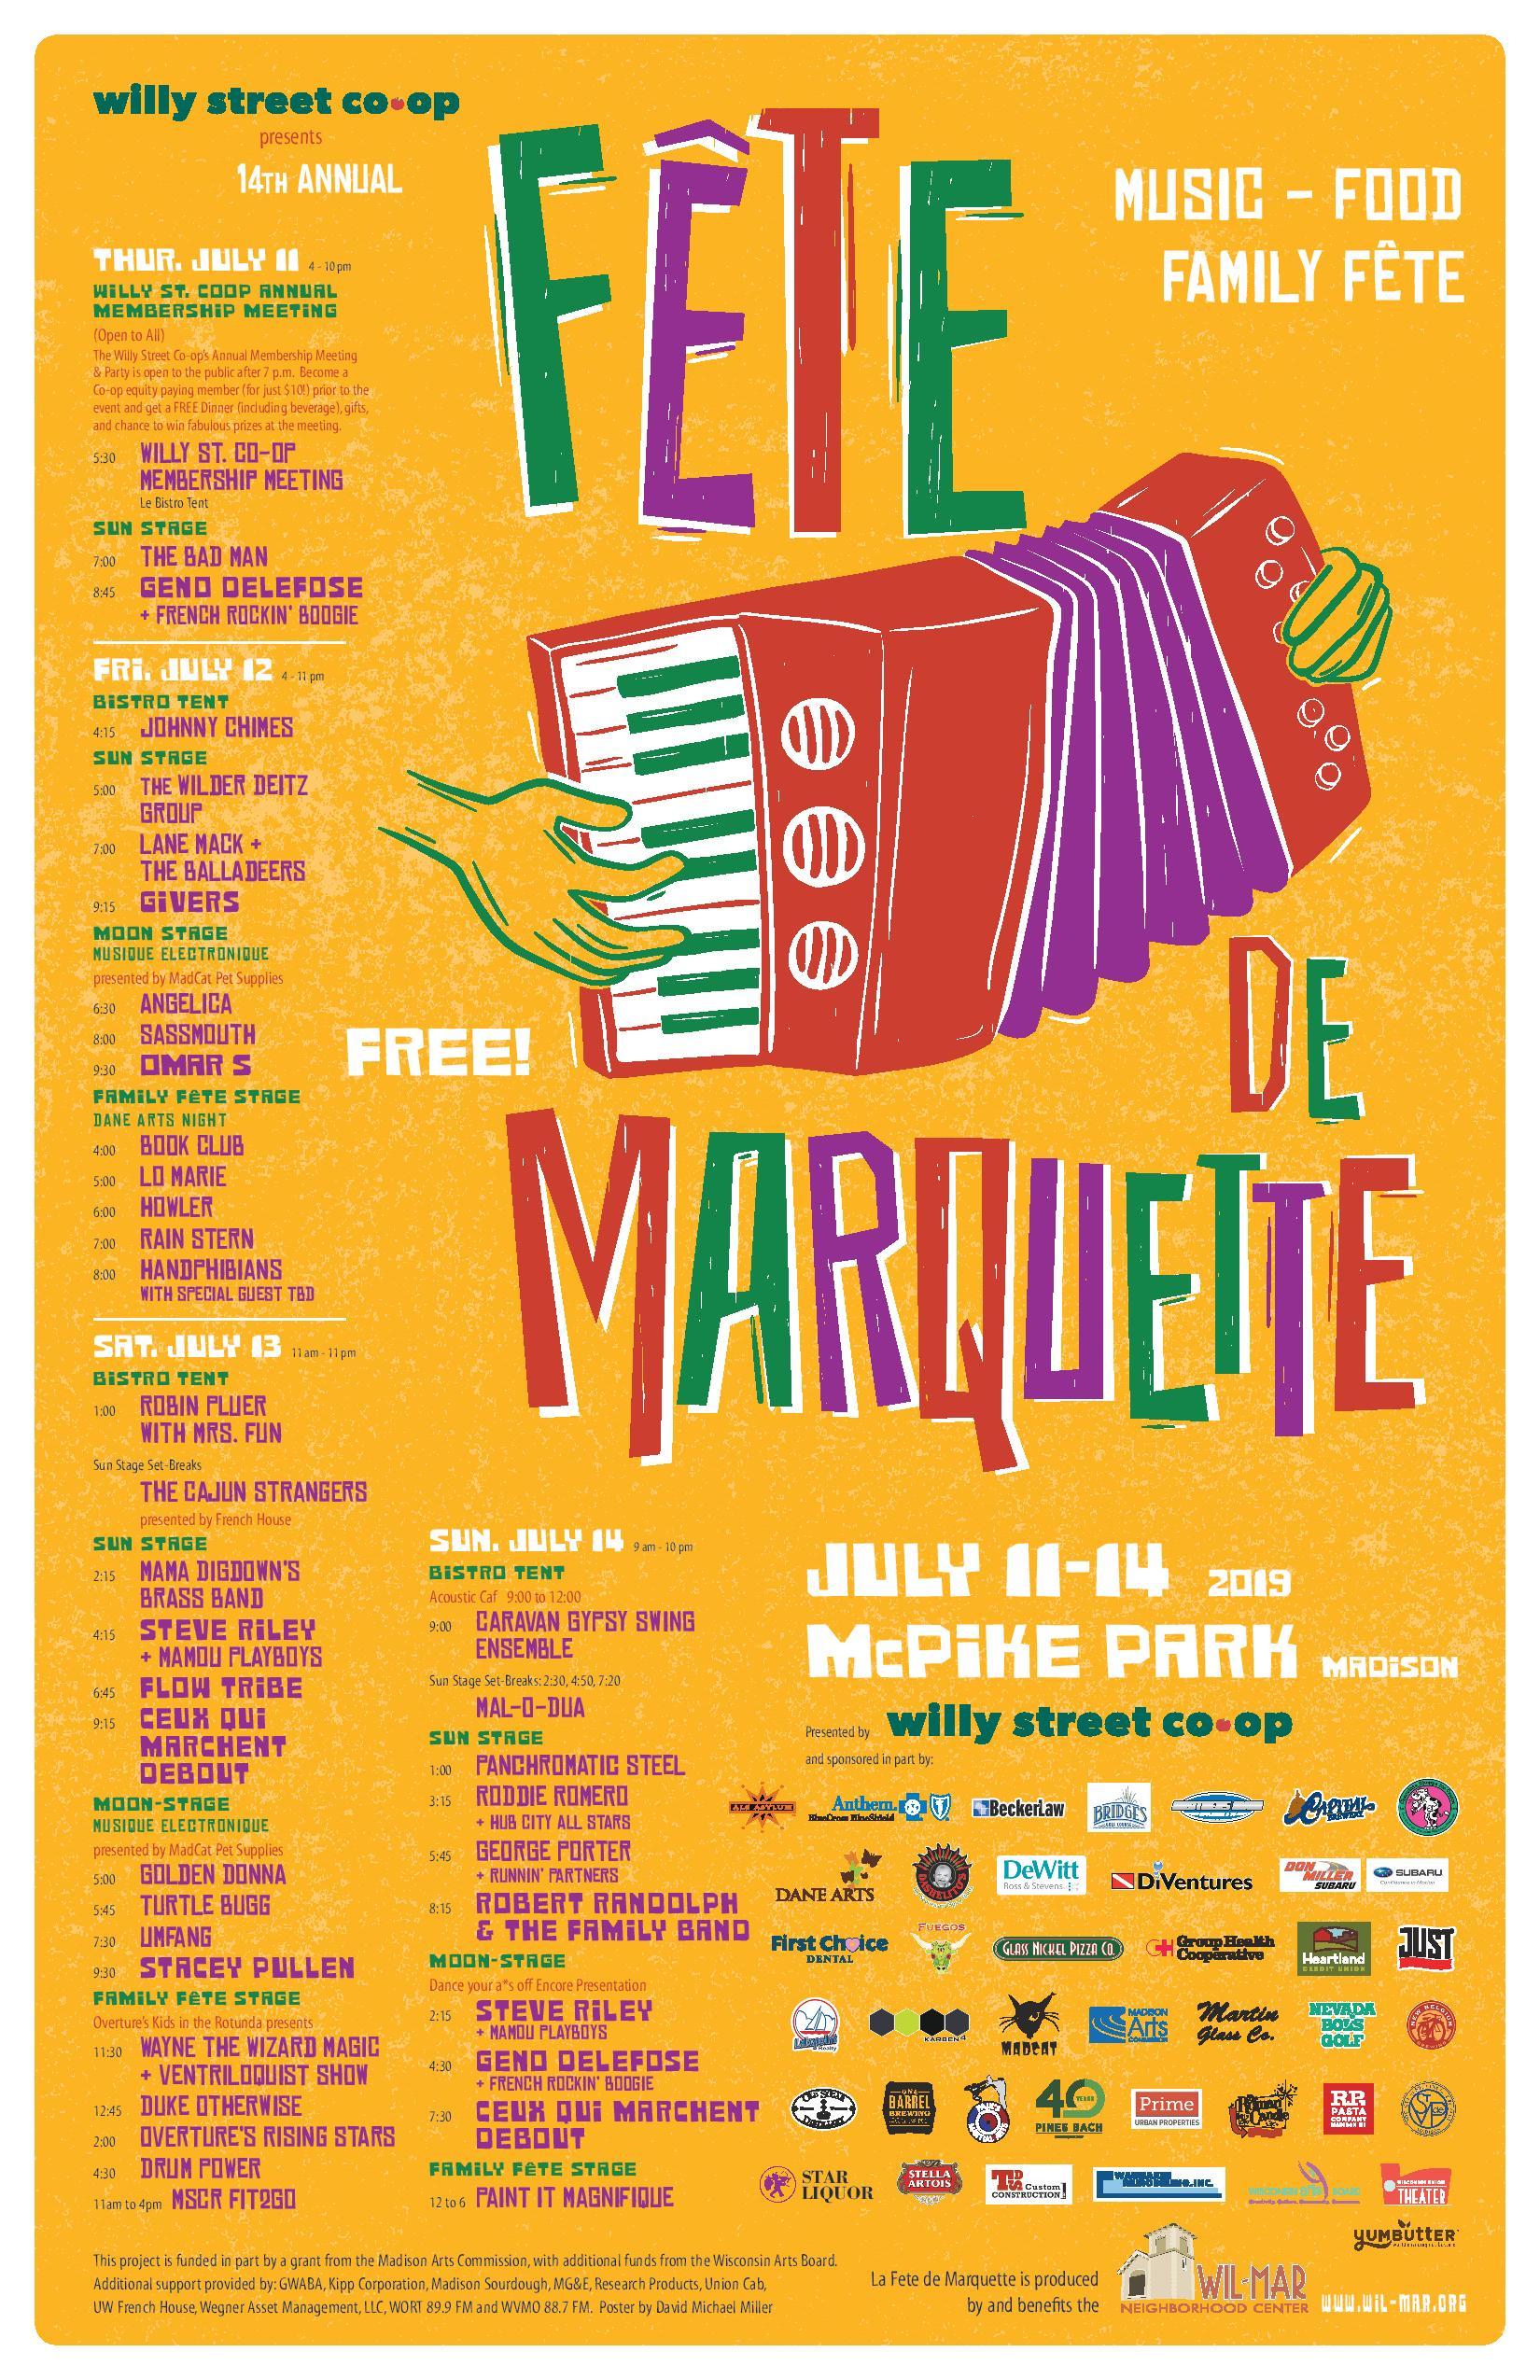 Fete de Marquette — Wil-Mar Neighborhood Center